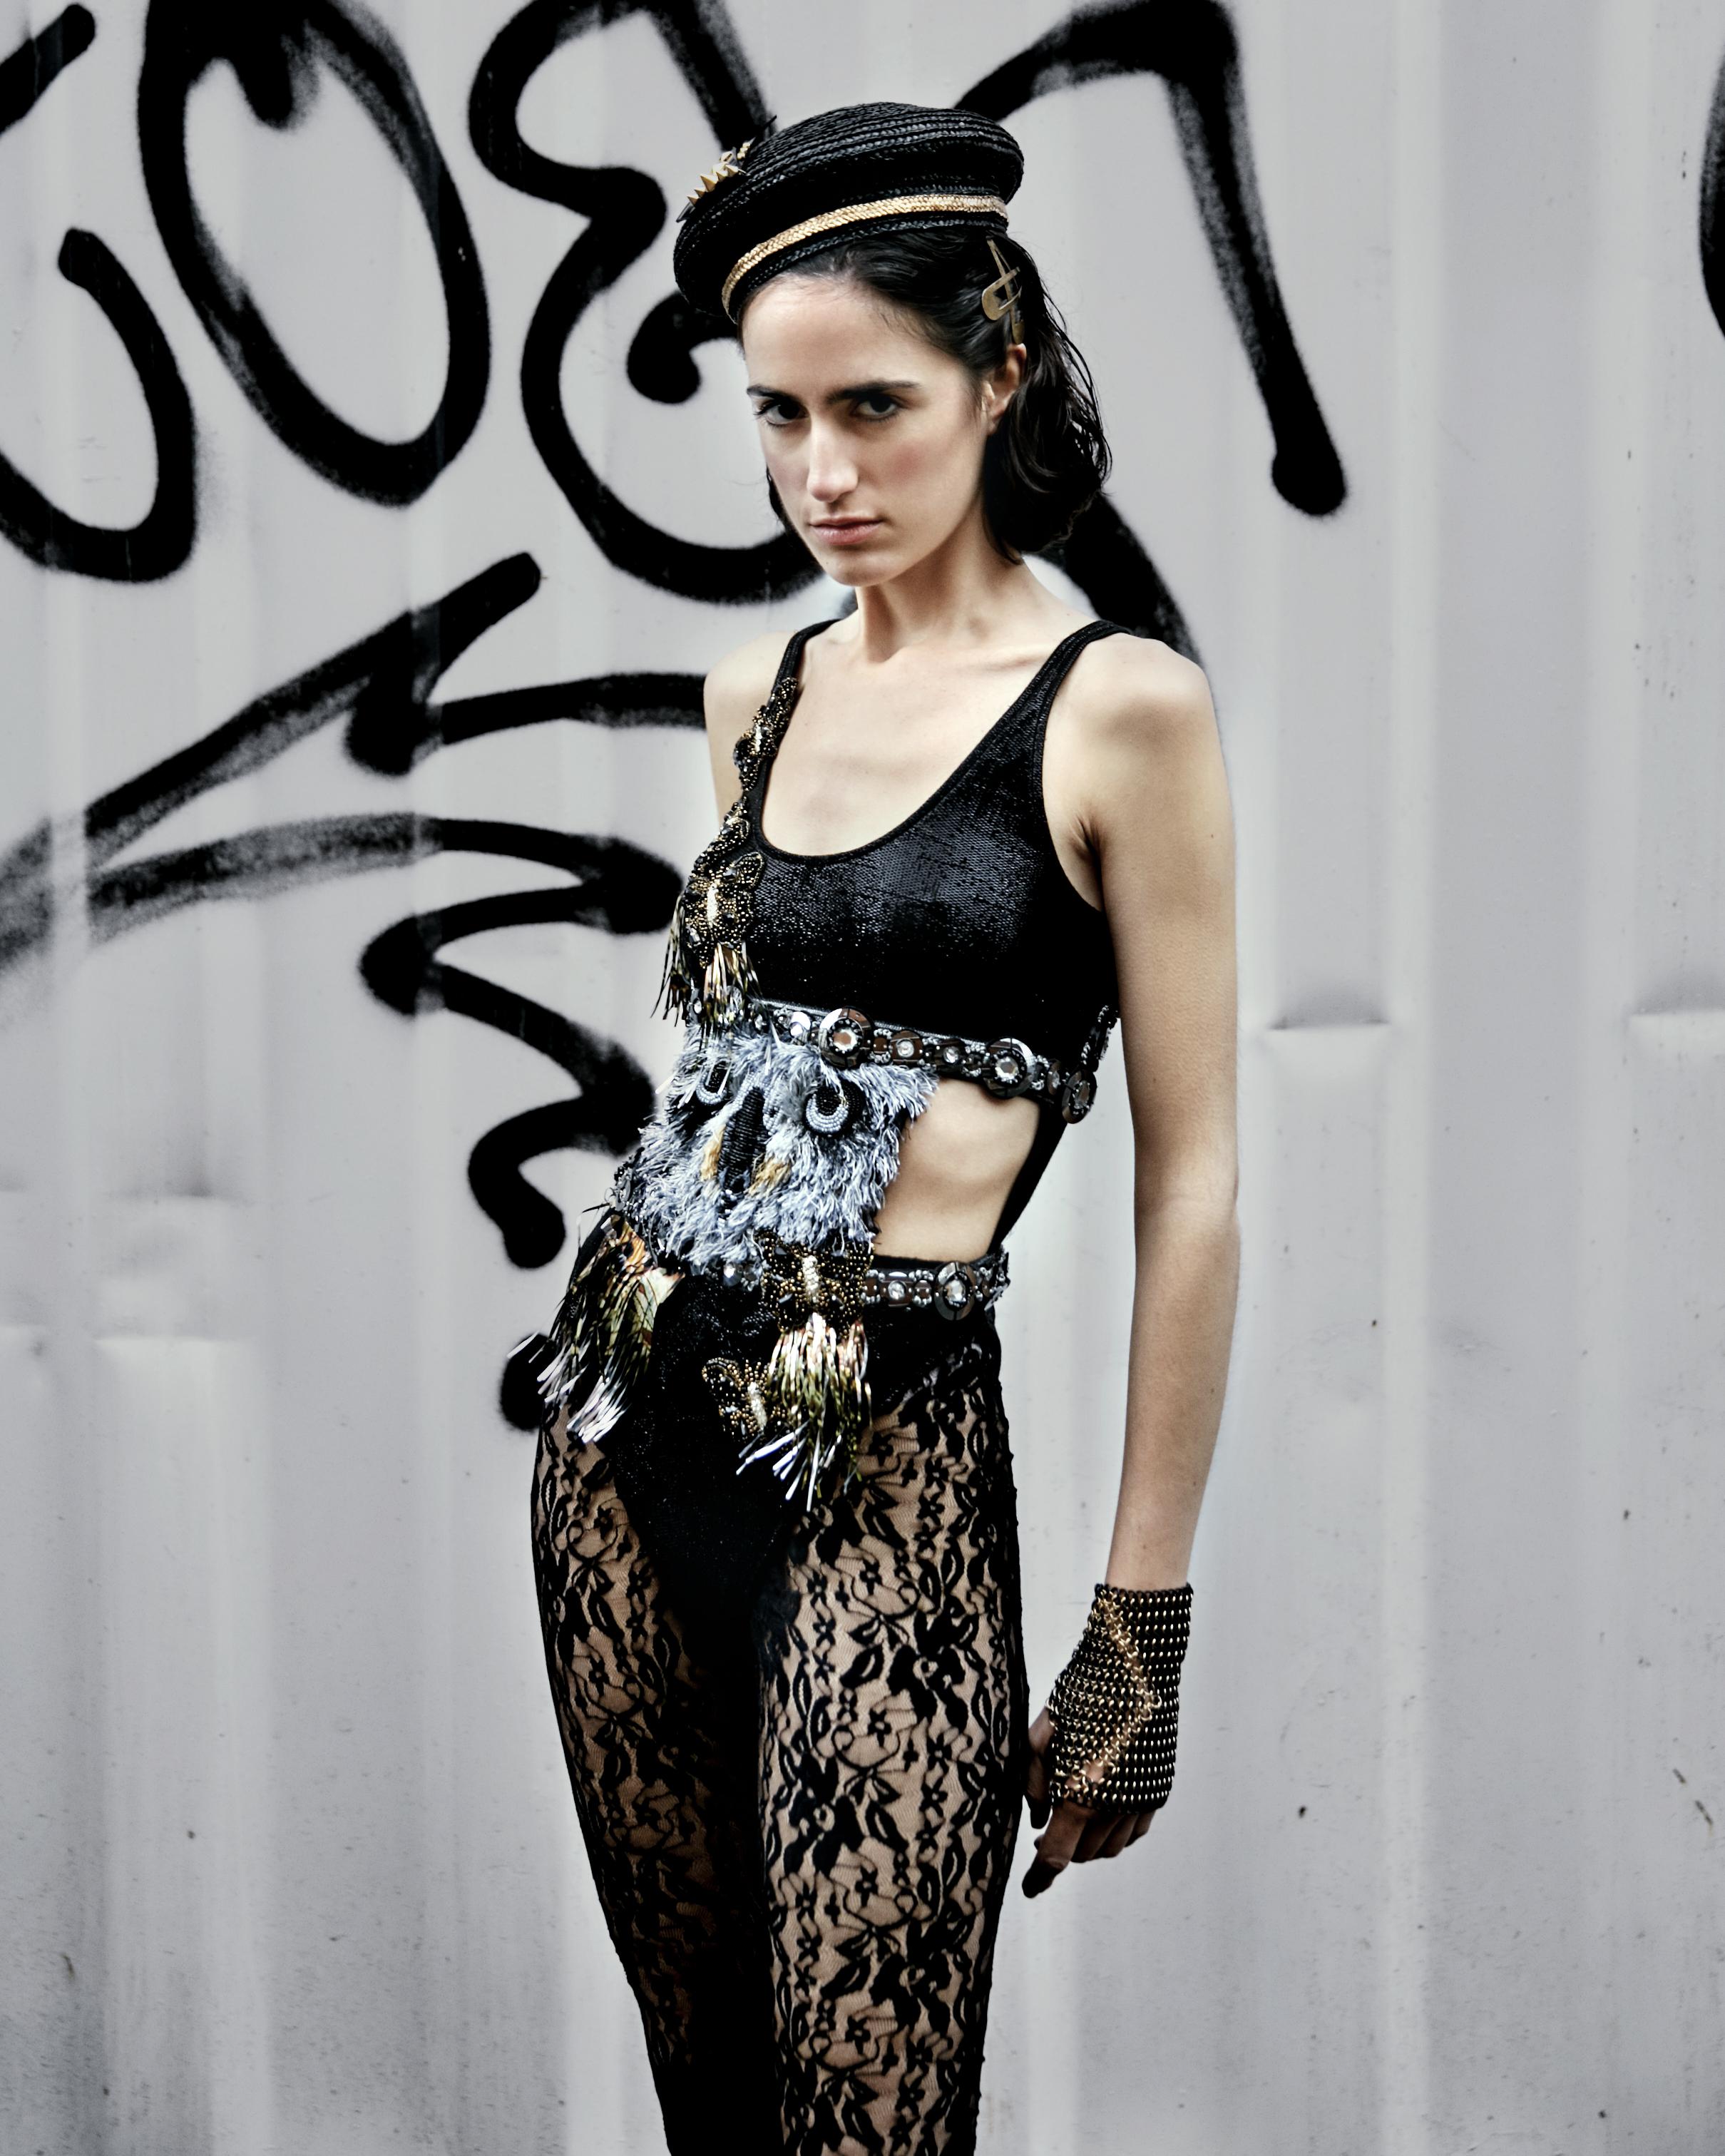 Trousers – LOS PECOS MUTANTES  Body – CUSTO BARCELONA  Hat – THAT HAT MADRID  Boots – PIMKIE  Bracelet – ELENA ESTAUN  Hair clips – CORTEFIEL